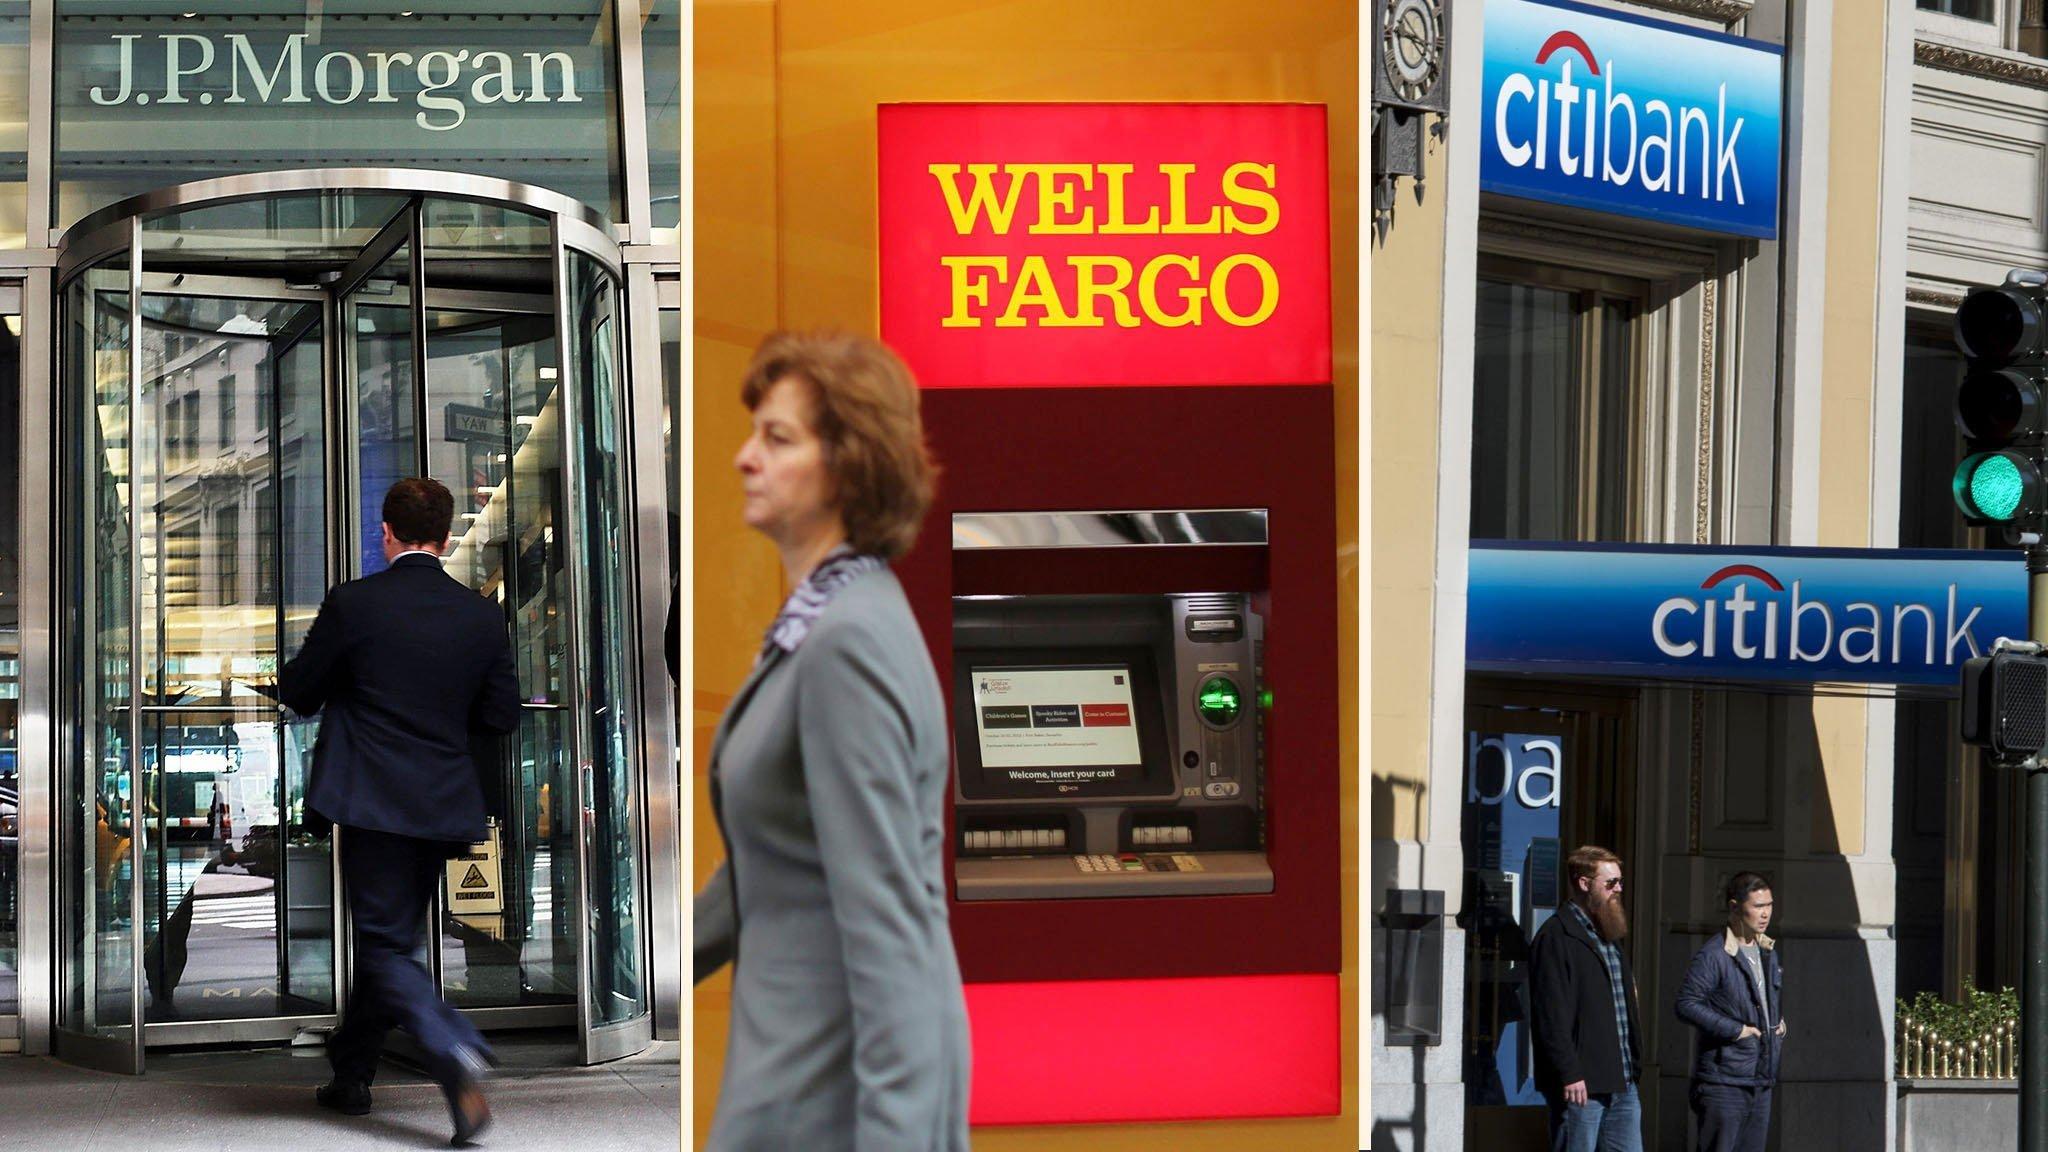 JPMorgan and Citi fail to impress investors despite strong